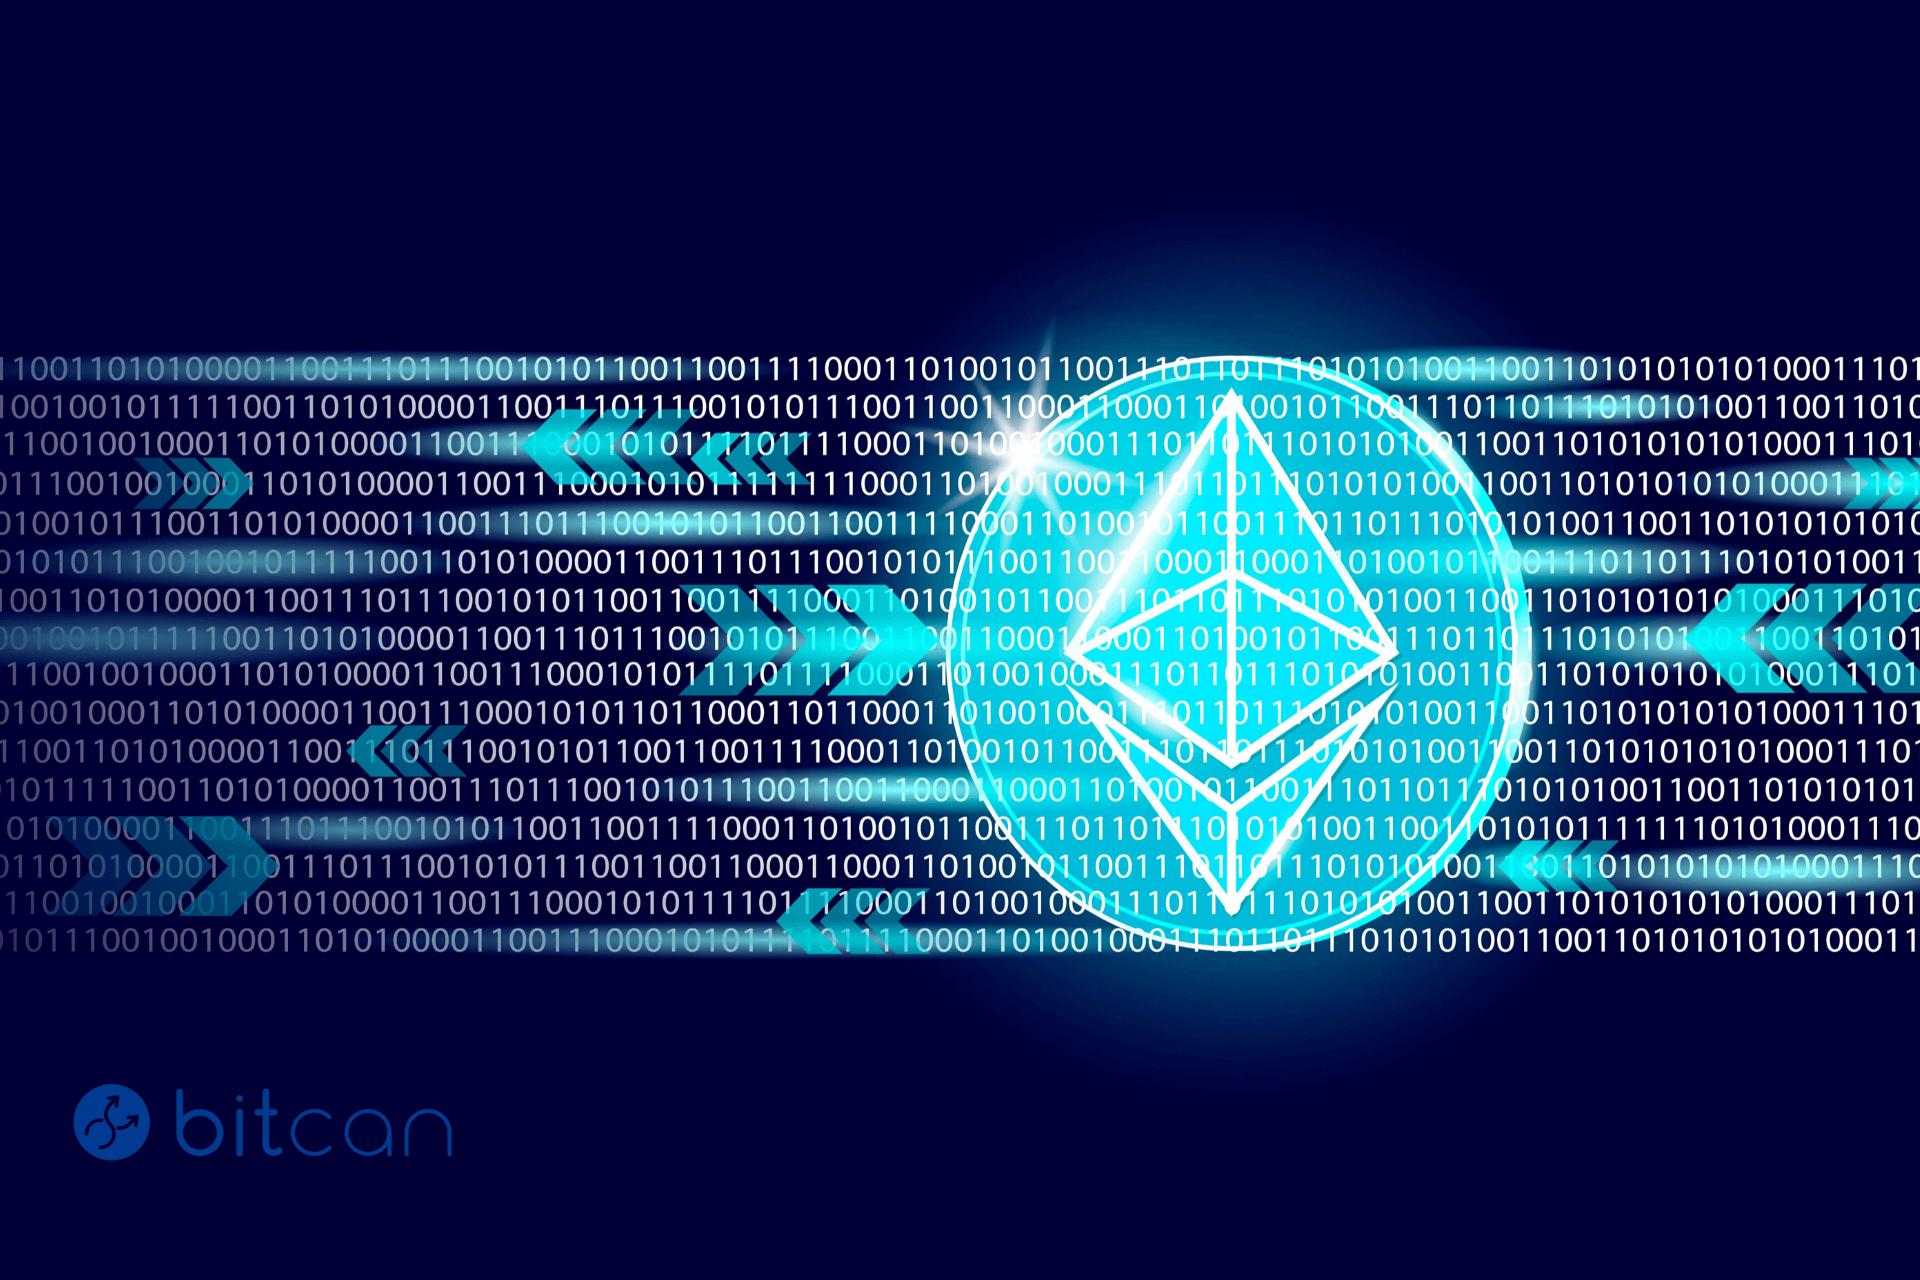 Co to jest Ethereum?